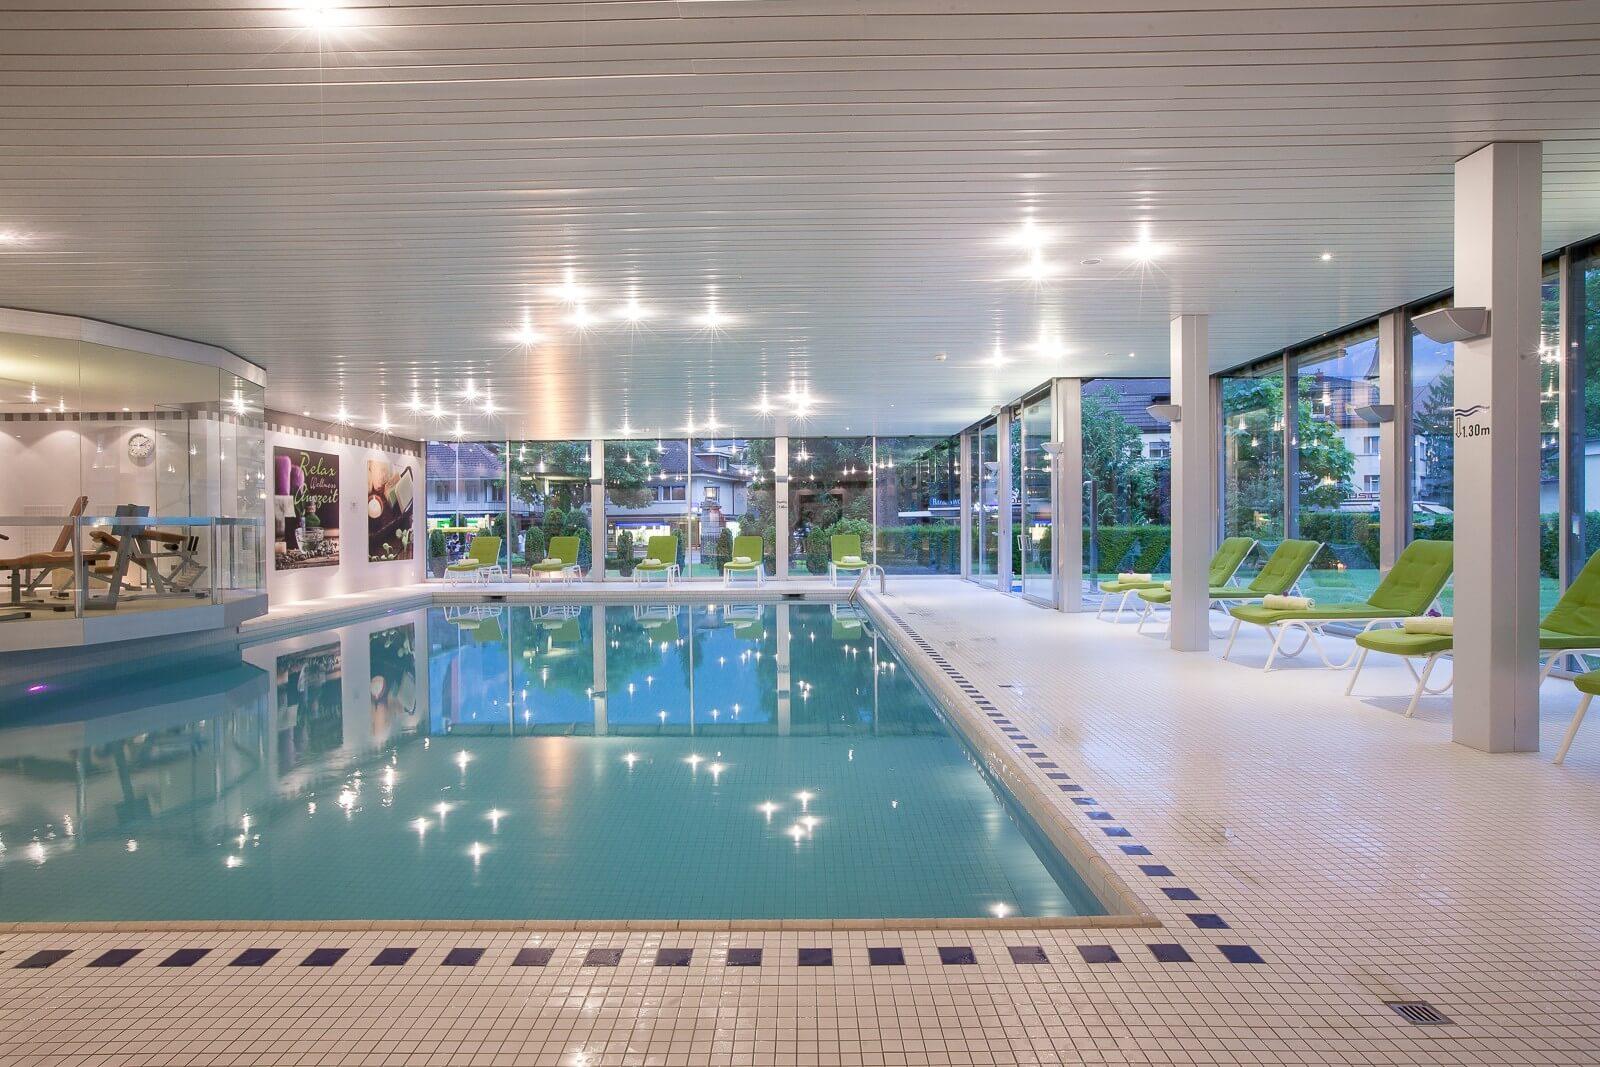 interlaken-clarins-beauty-center-pool